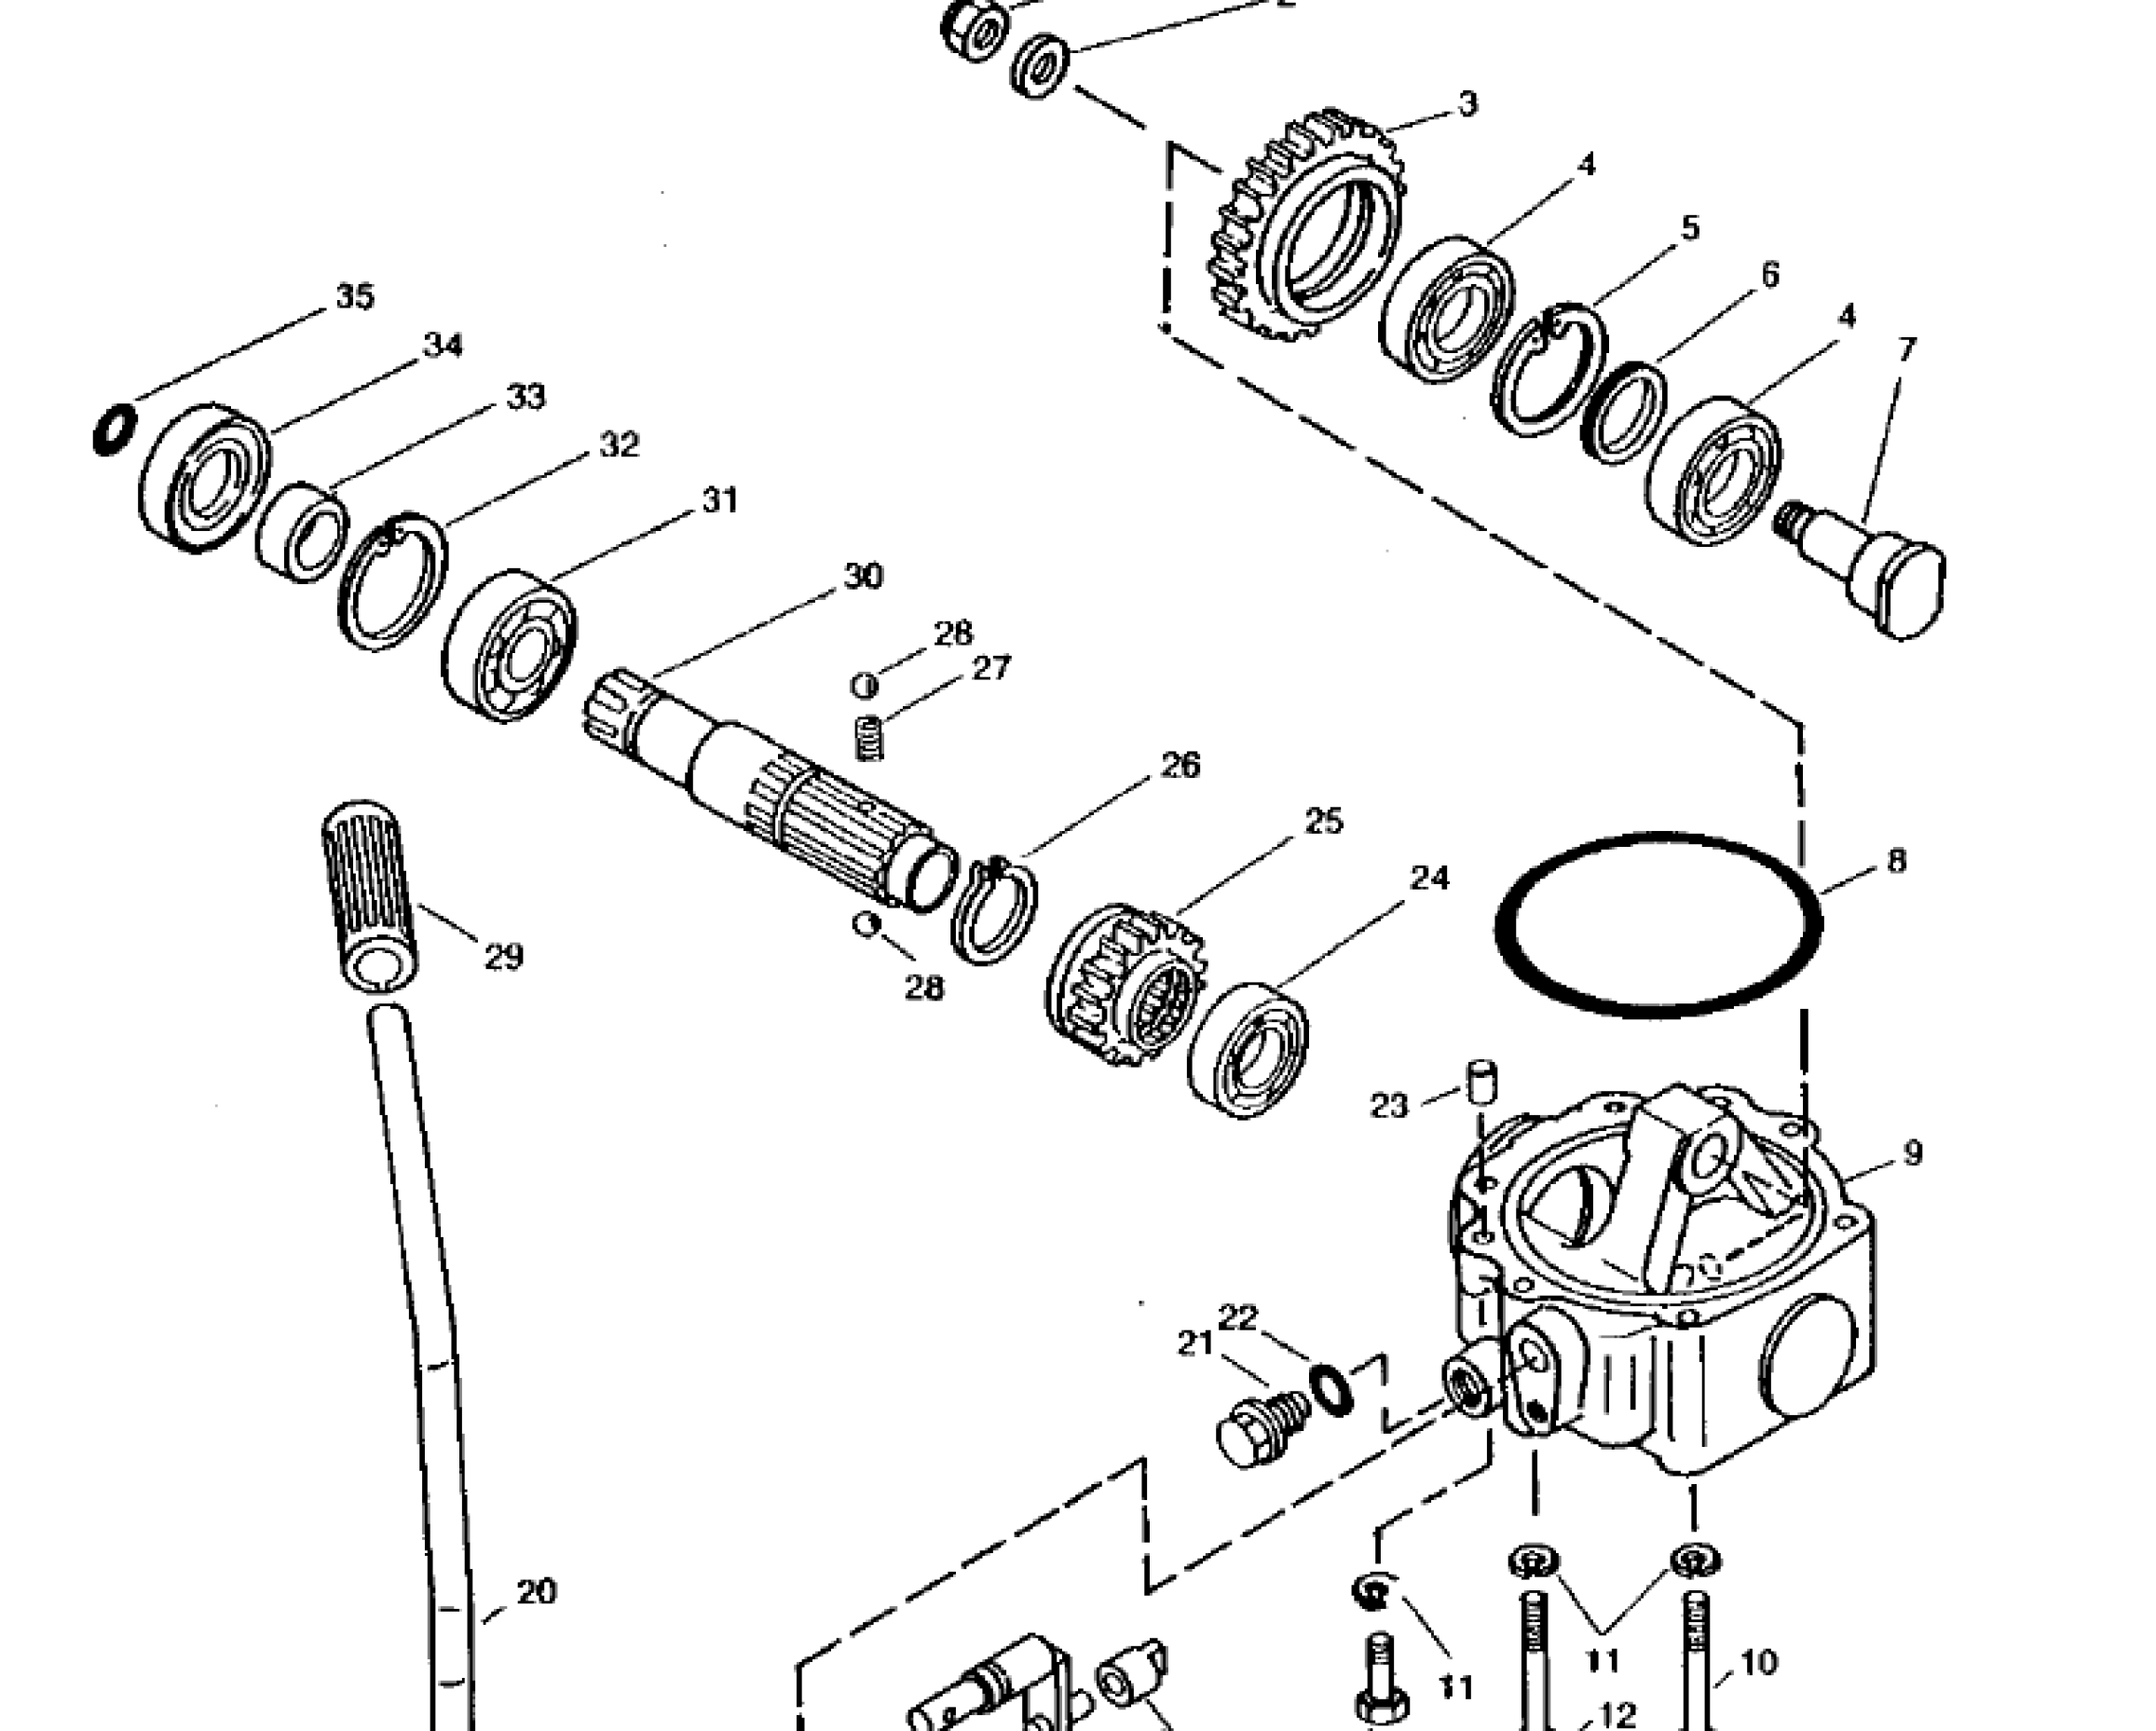 4wd Drop Box Parts for John Deere Compact Tractors John Deere Tractor Wiring Harness on john deere 314 wiring harness, lawn tractor wiring harness, john deere lt133 wiring harness, john deere 6420 wiring diagram, locomotive wiring harness, john deere l118 wiring harness, john deere radio harness, john deere b wiring, john deere baler wiring harness, antique tractor wiring harness, riding lawn mower wiring harness, snapper riding mower wiring harness, john deere diesel wiring harness, john deere 1010 tractor wiring, case tractor wiring harness, john deere wiring harness diagram, john deere 4020 wiring harness, john deere ignition wiring diagram, john deere 1020 wiring harness, john deere 3020 starter wiring,